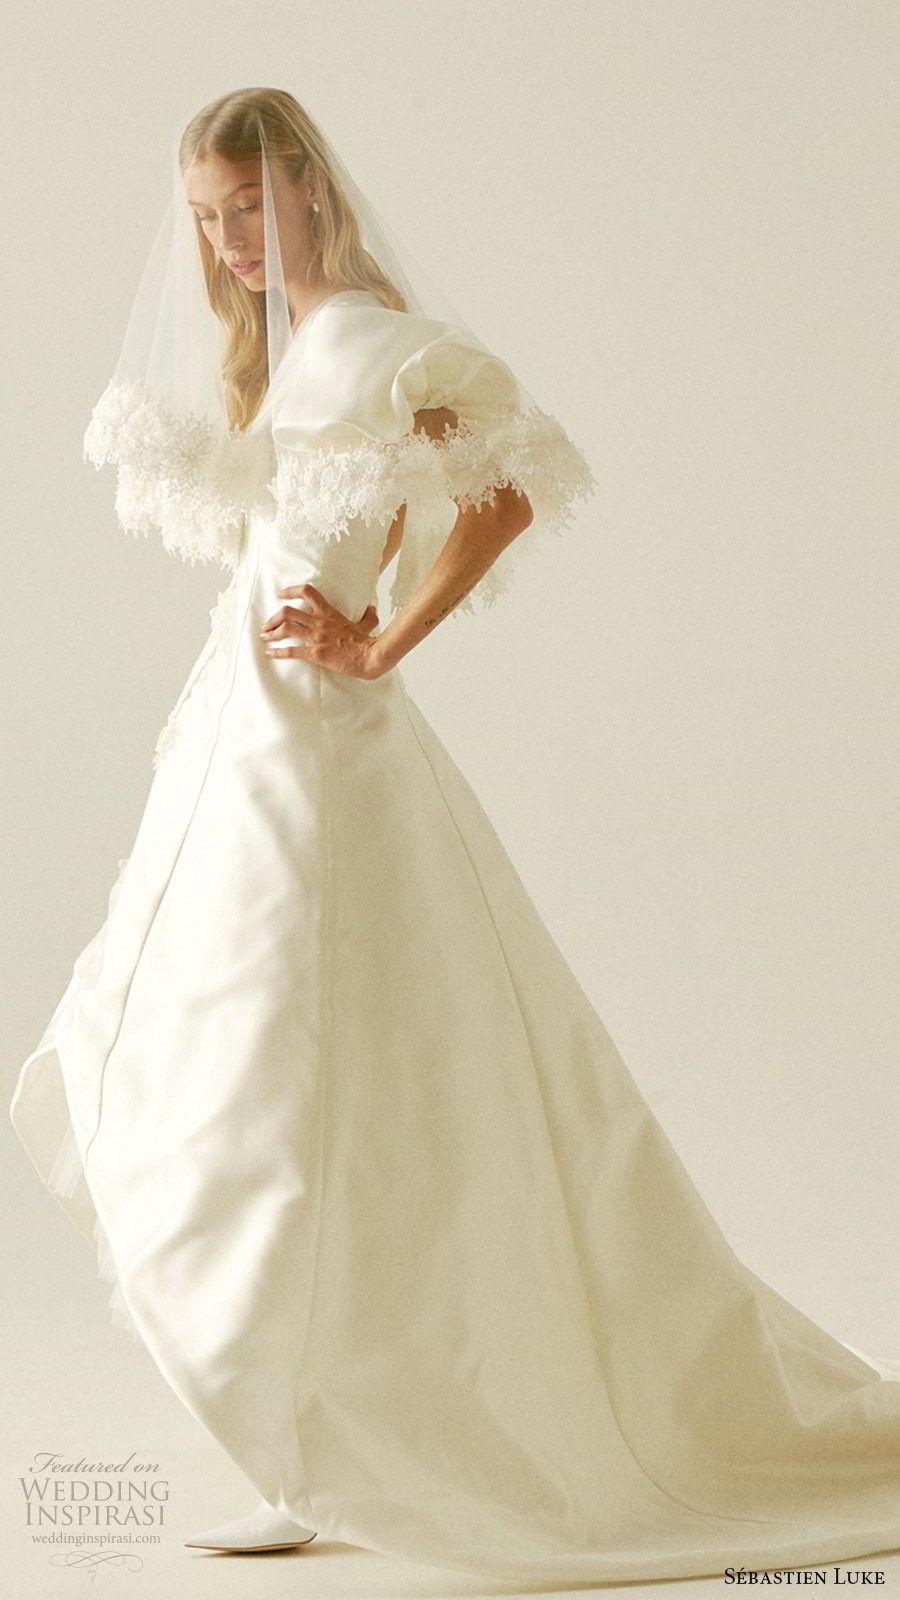 sebastien luke fall 2019 bridal short puff sleeves v neckline high low skirt a line wedding dress coat chapel trainmodern romantic veil (7) sv